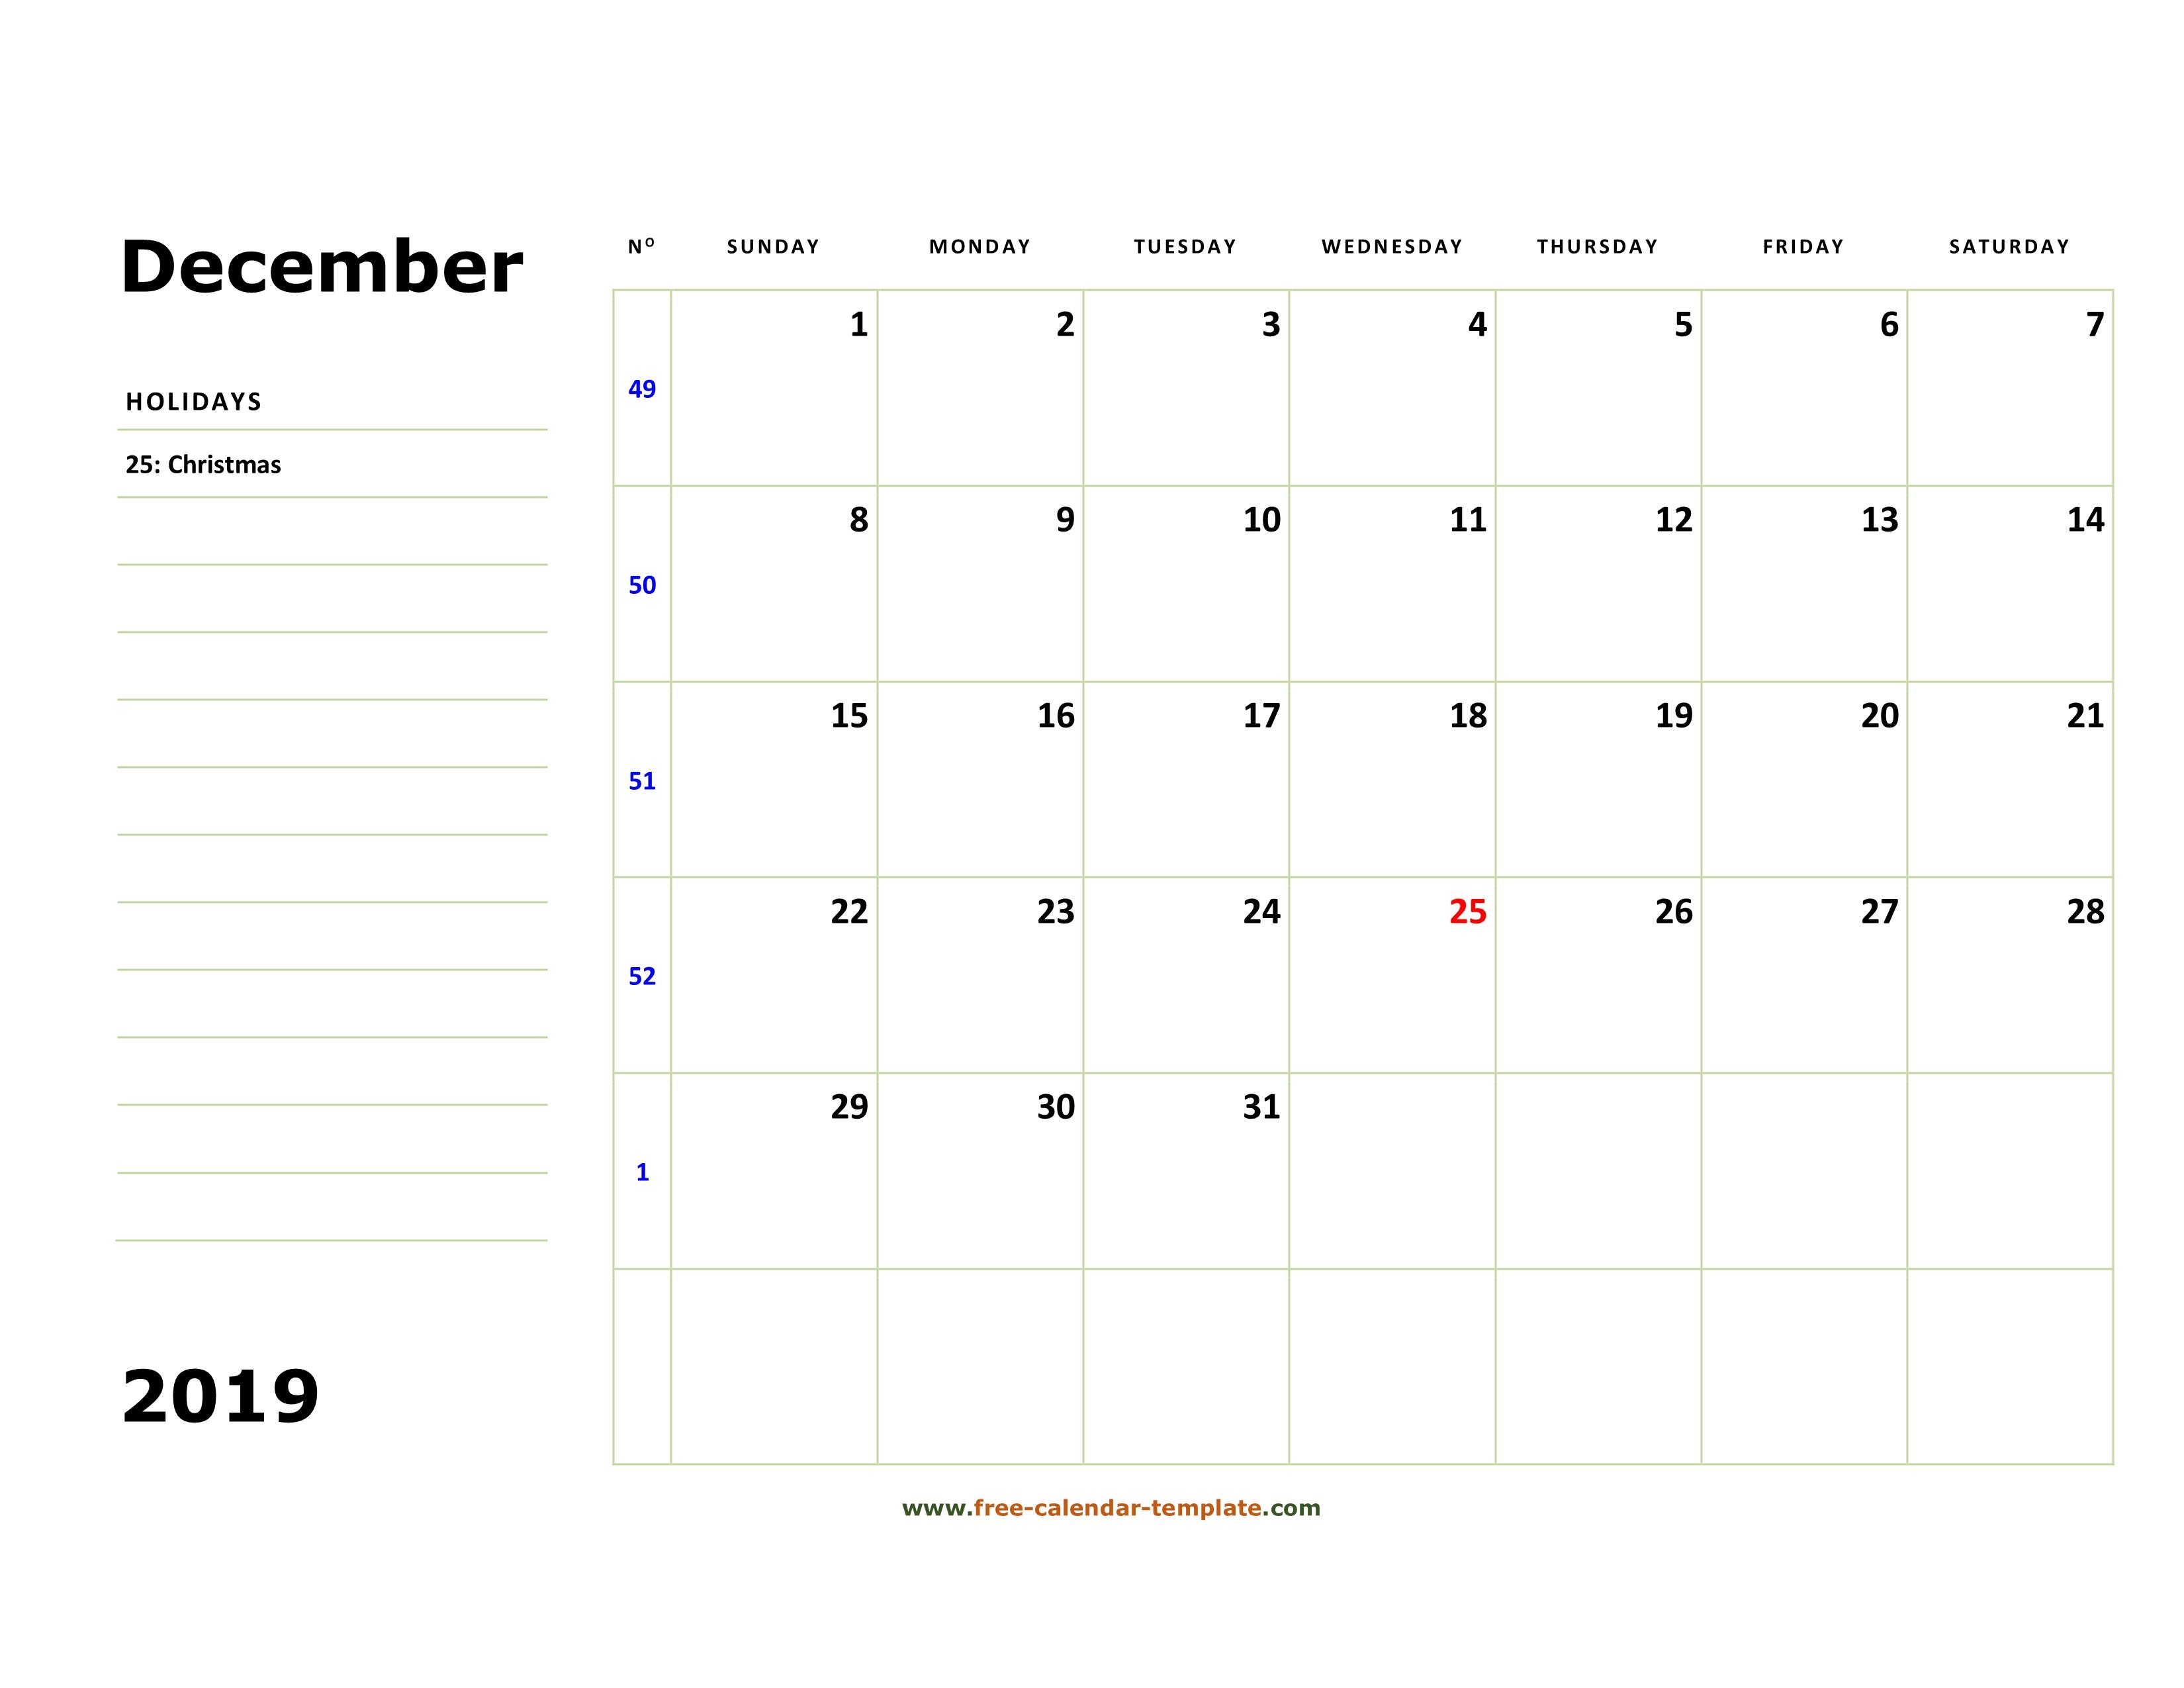 December 2019 Free Calendar Tempplate | Freecalendar regarding Calendar With Blank Squares